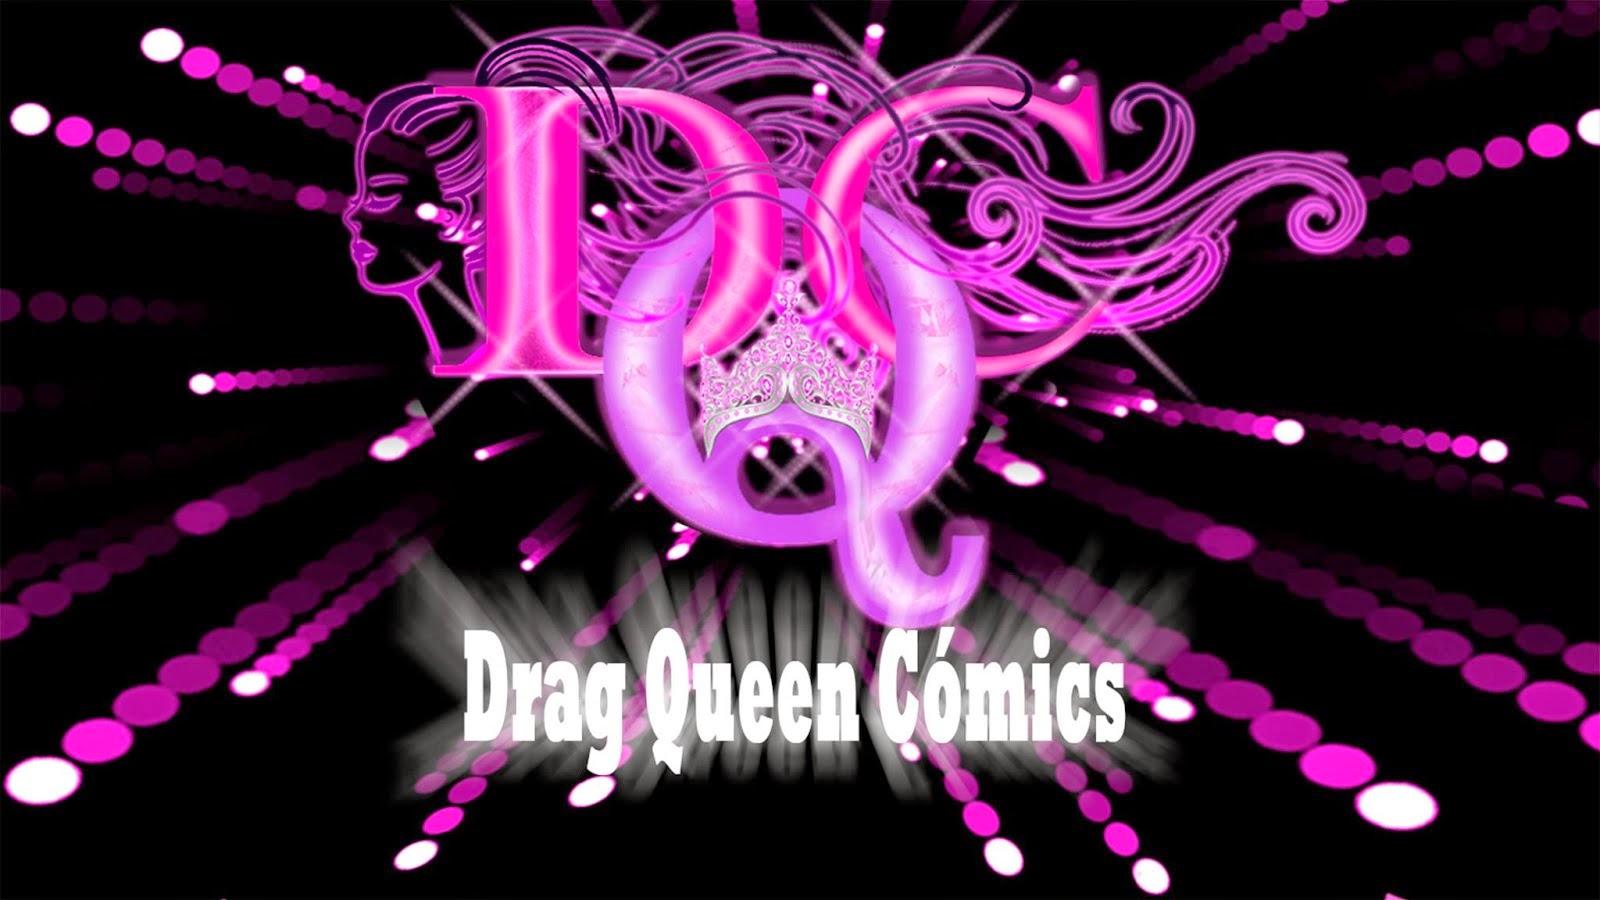 Te gusta dibujar y eres fan del Drag?